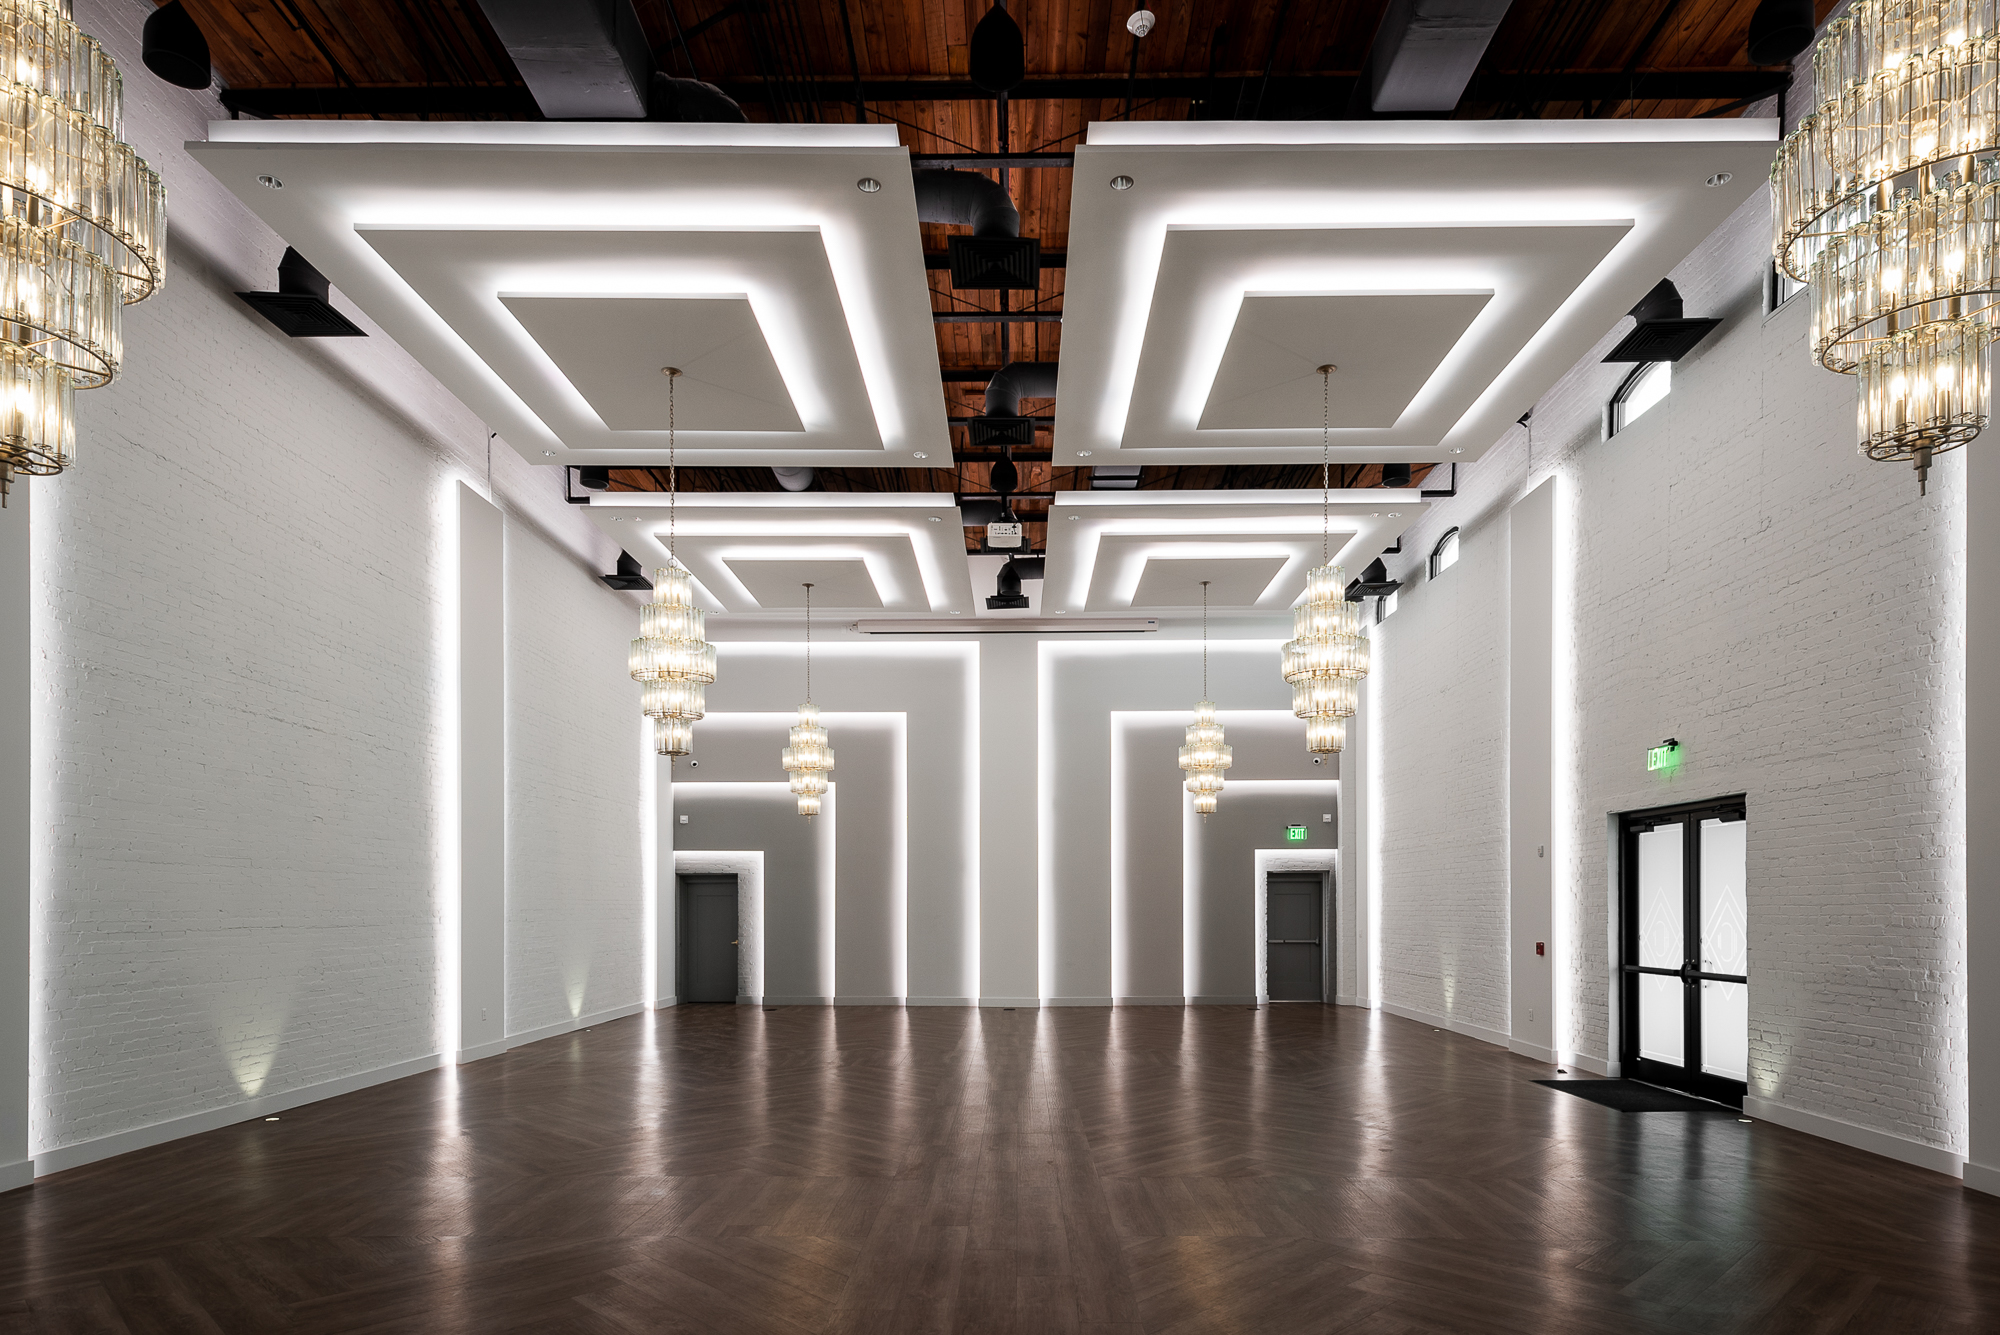 Micamy Design Studio_Interior Design_Clay Theatre_Event Space_Venue_Wedding_Art Deco_Modern_Event Hall_Dance Hall_Banquet Hall_Dance Floor_Chandeliers.jpg